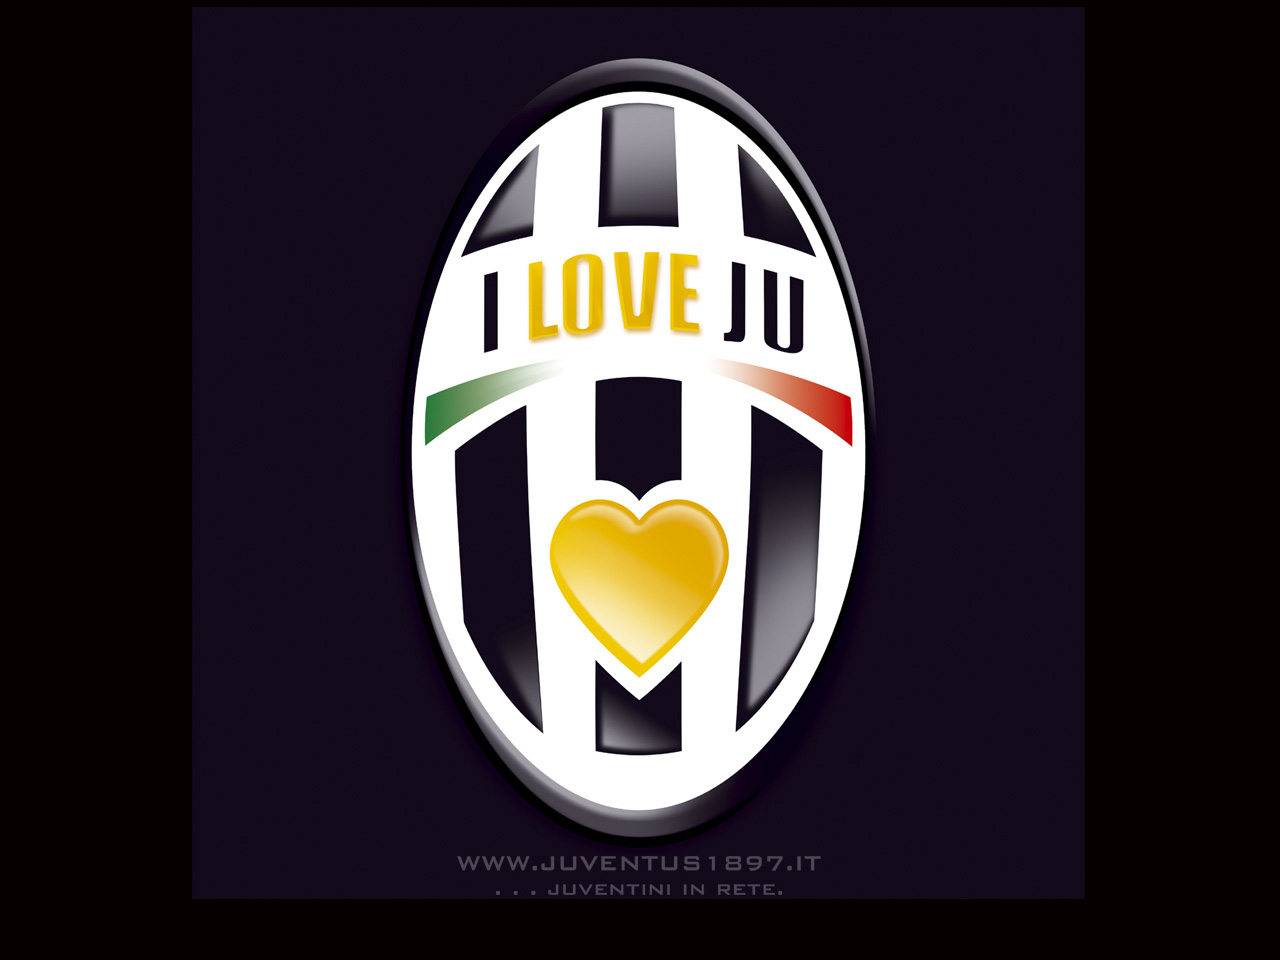 Immagini juventus foto video gallery we heart it for Immagini juventus